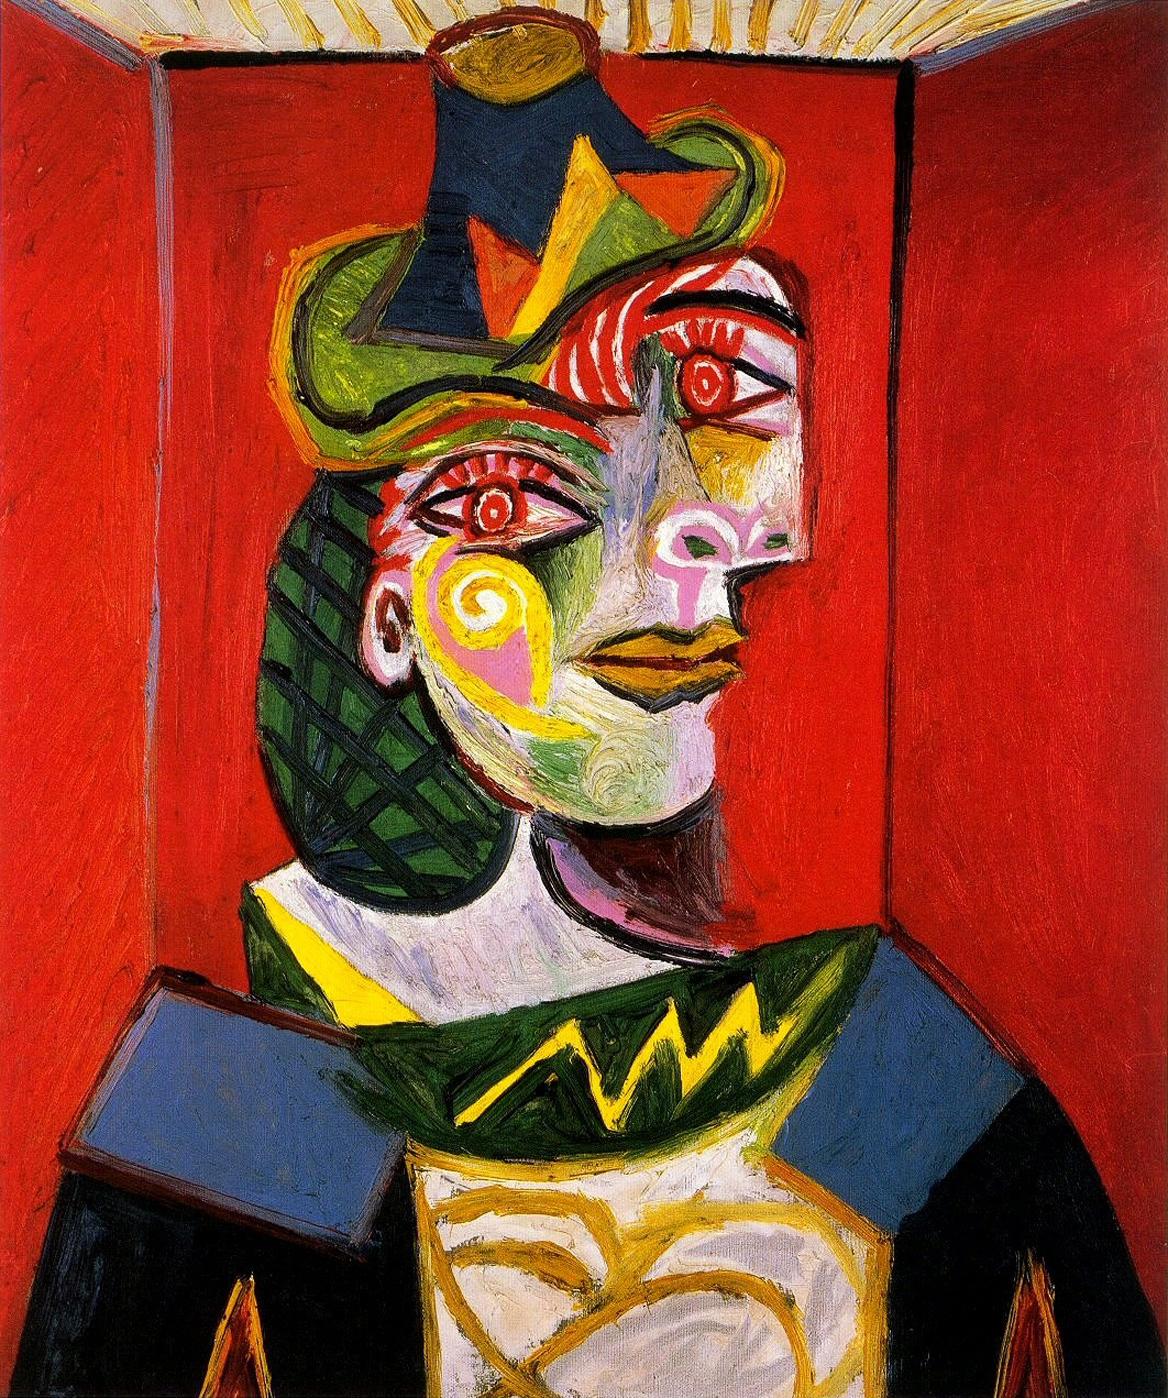 Dora Maar by Picasso, 1938